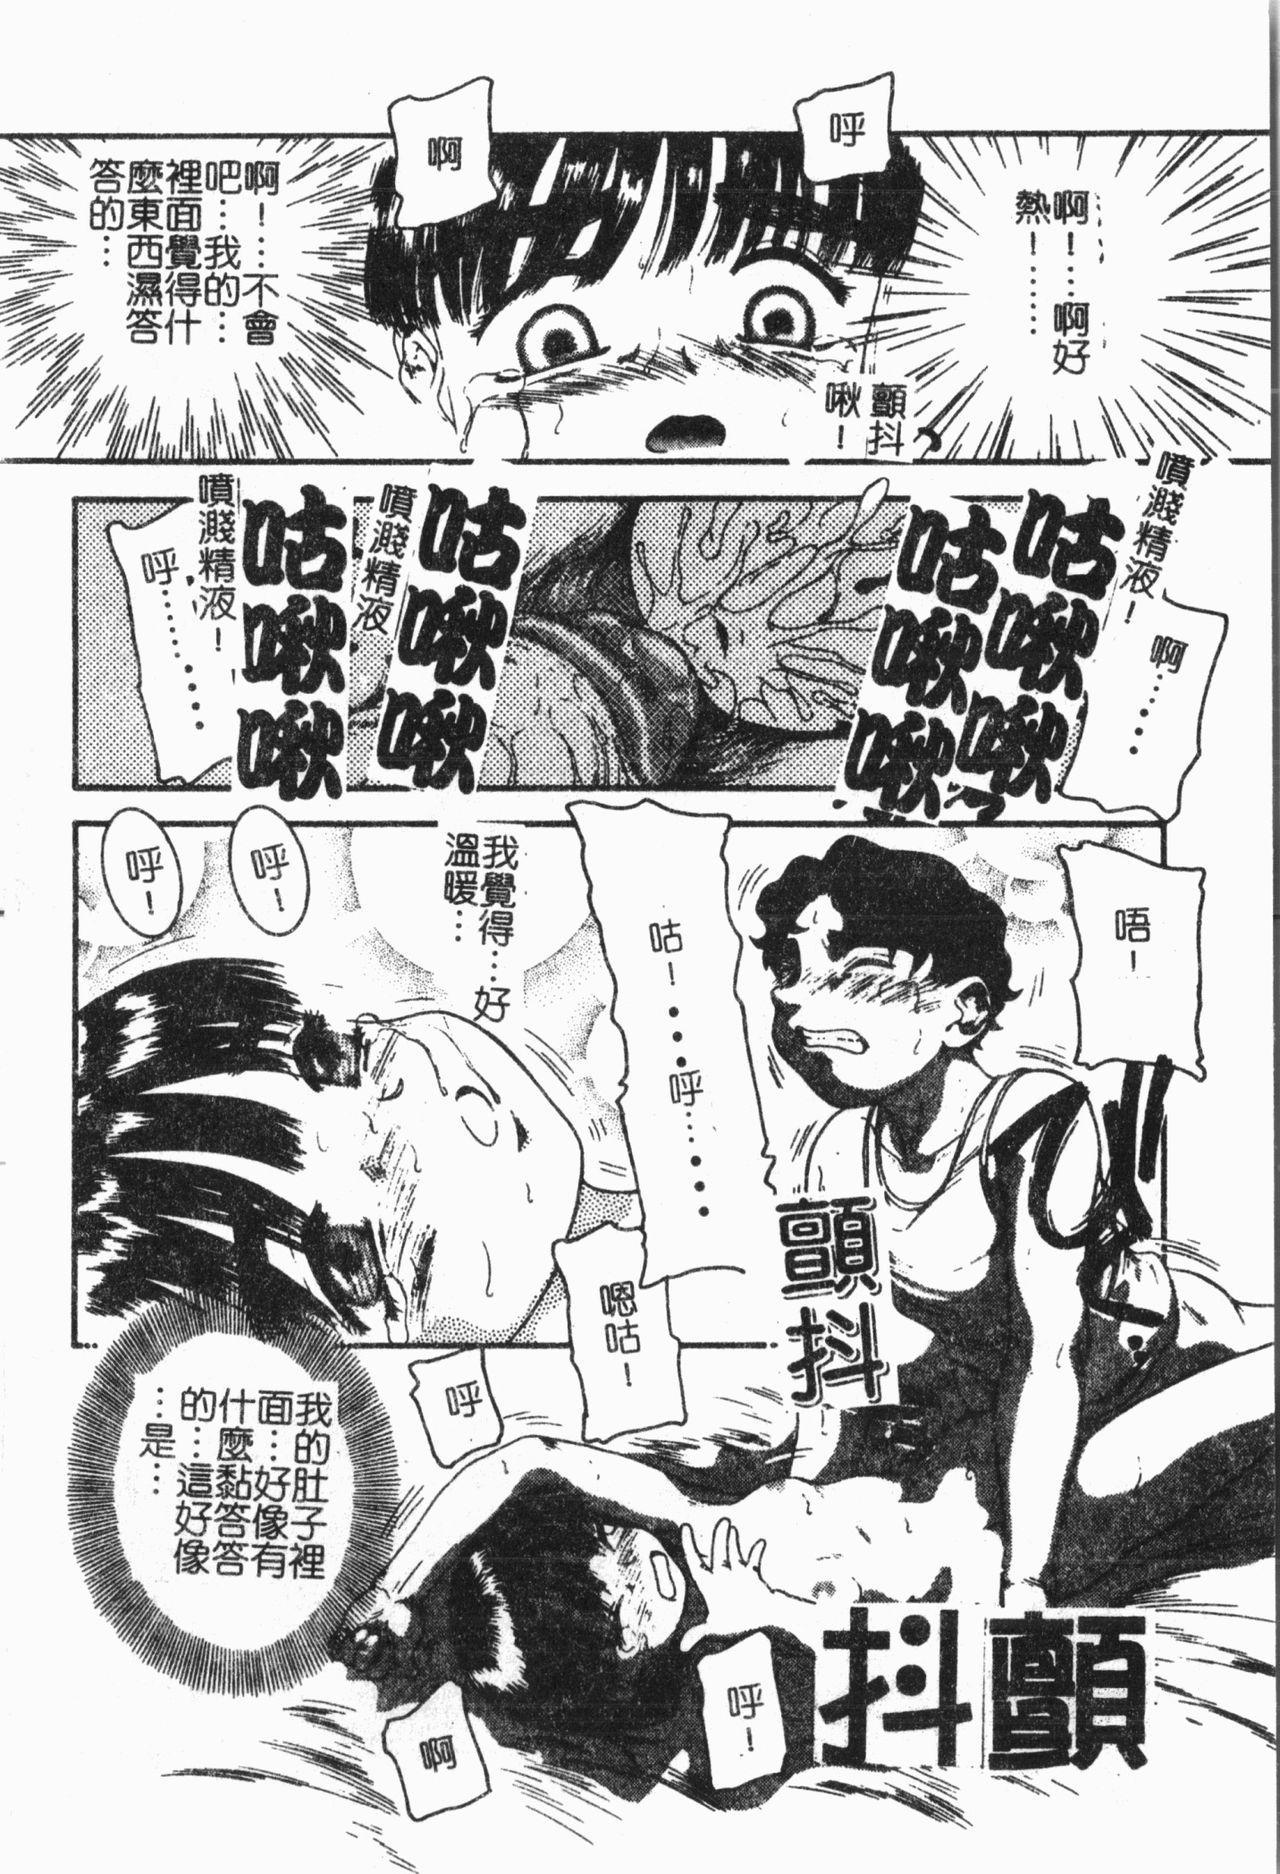 Imouto Koishi 6 54